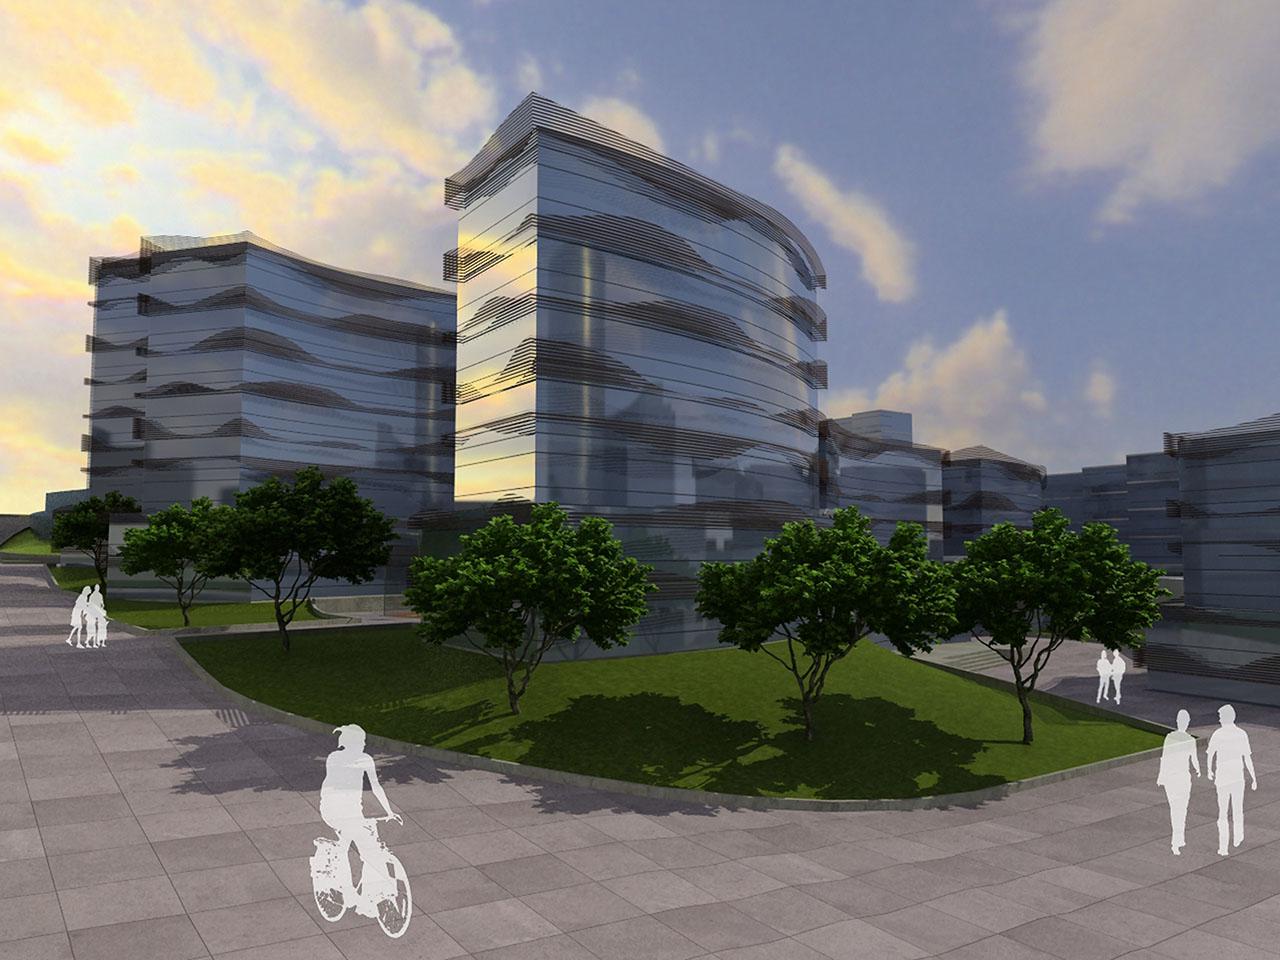 Bayrampasa Center Urban Transformation Project